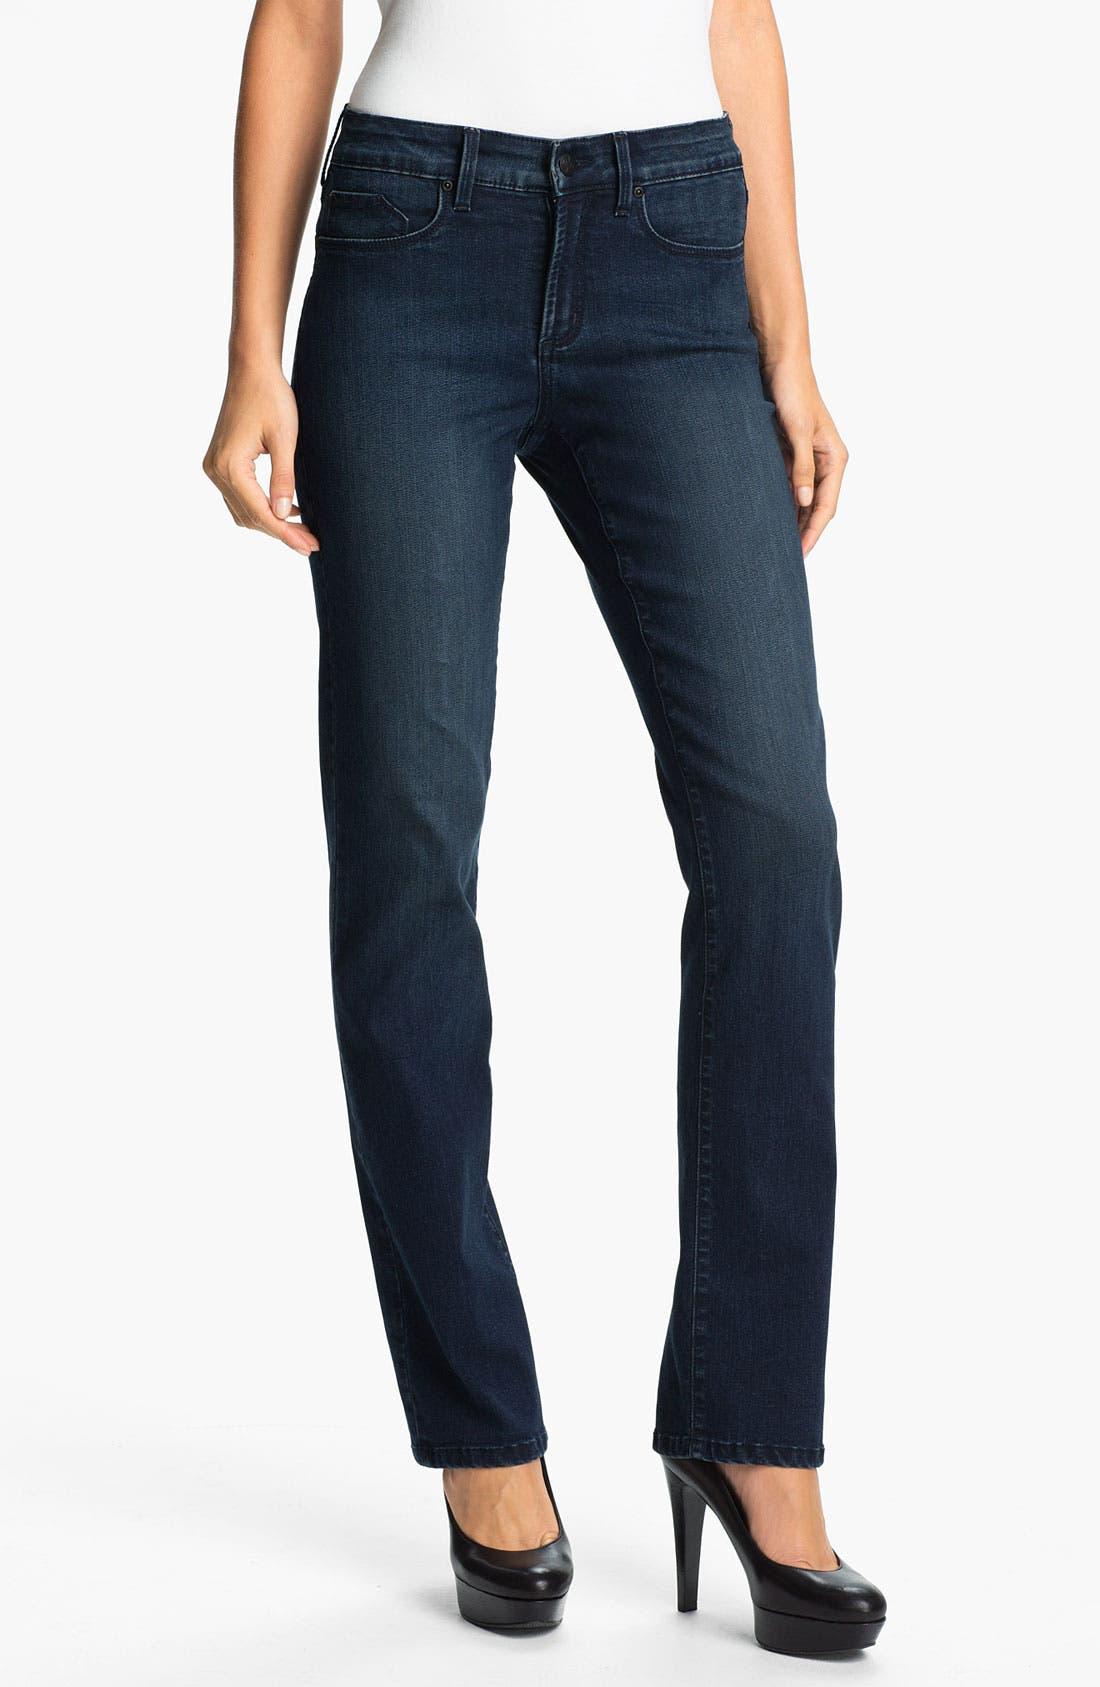 Main Image - NYDJ 'Marilyn' Straight Leg Jeans (Petite)